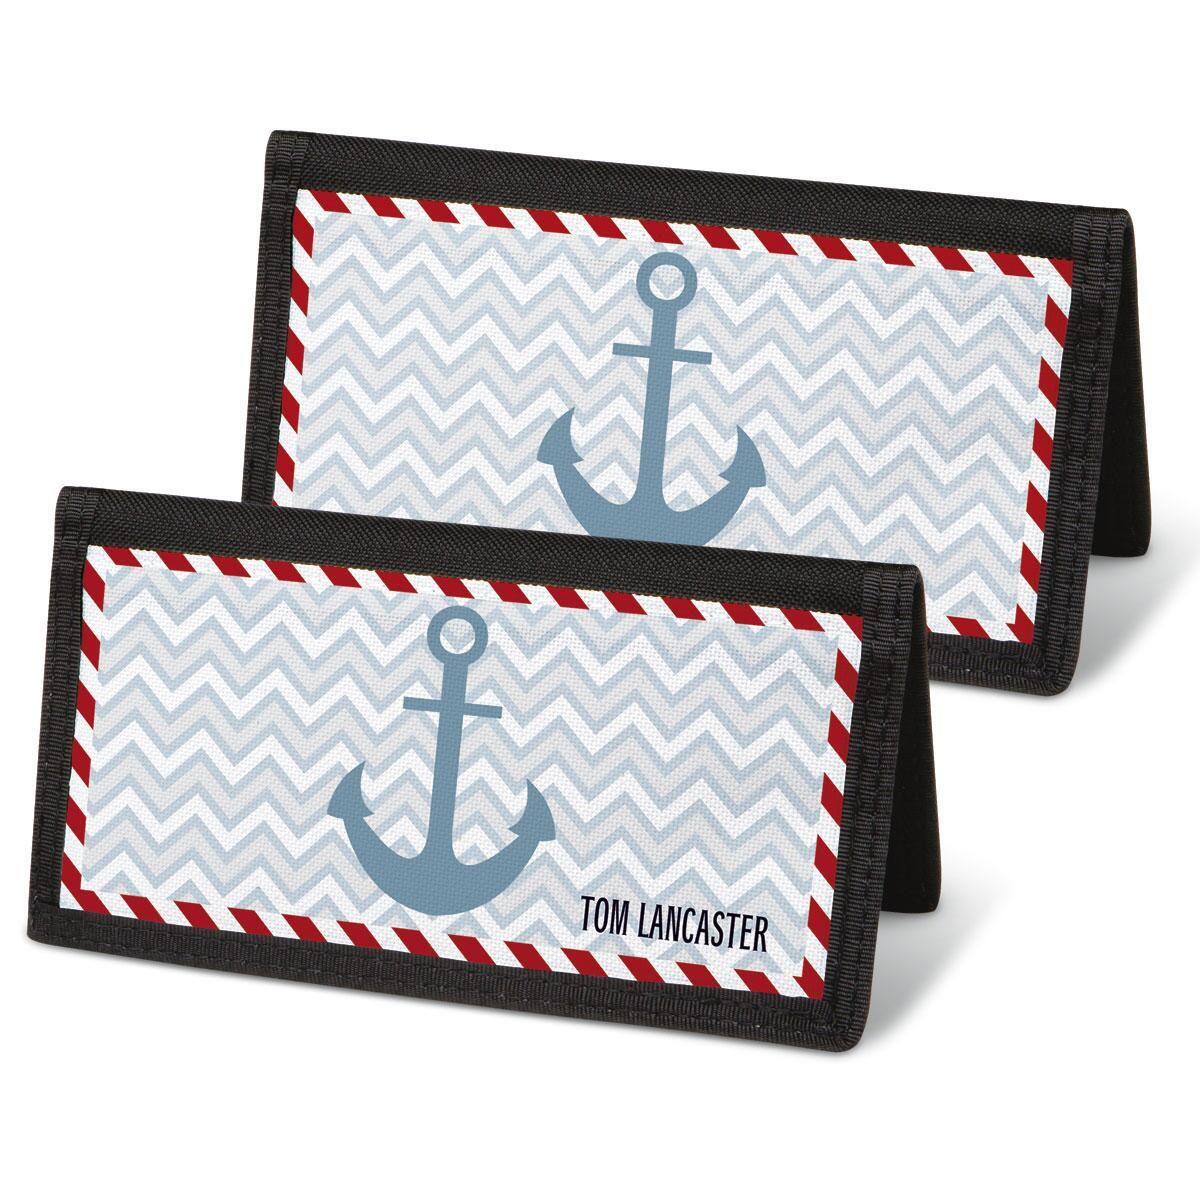 Nautical Chic Checkbook Cover - Personalized